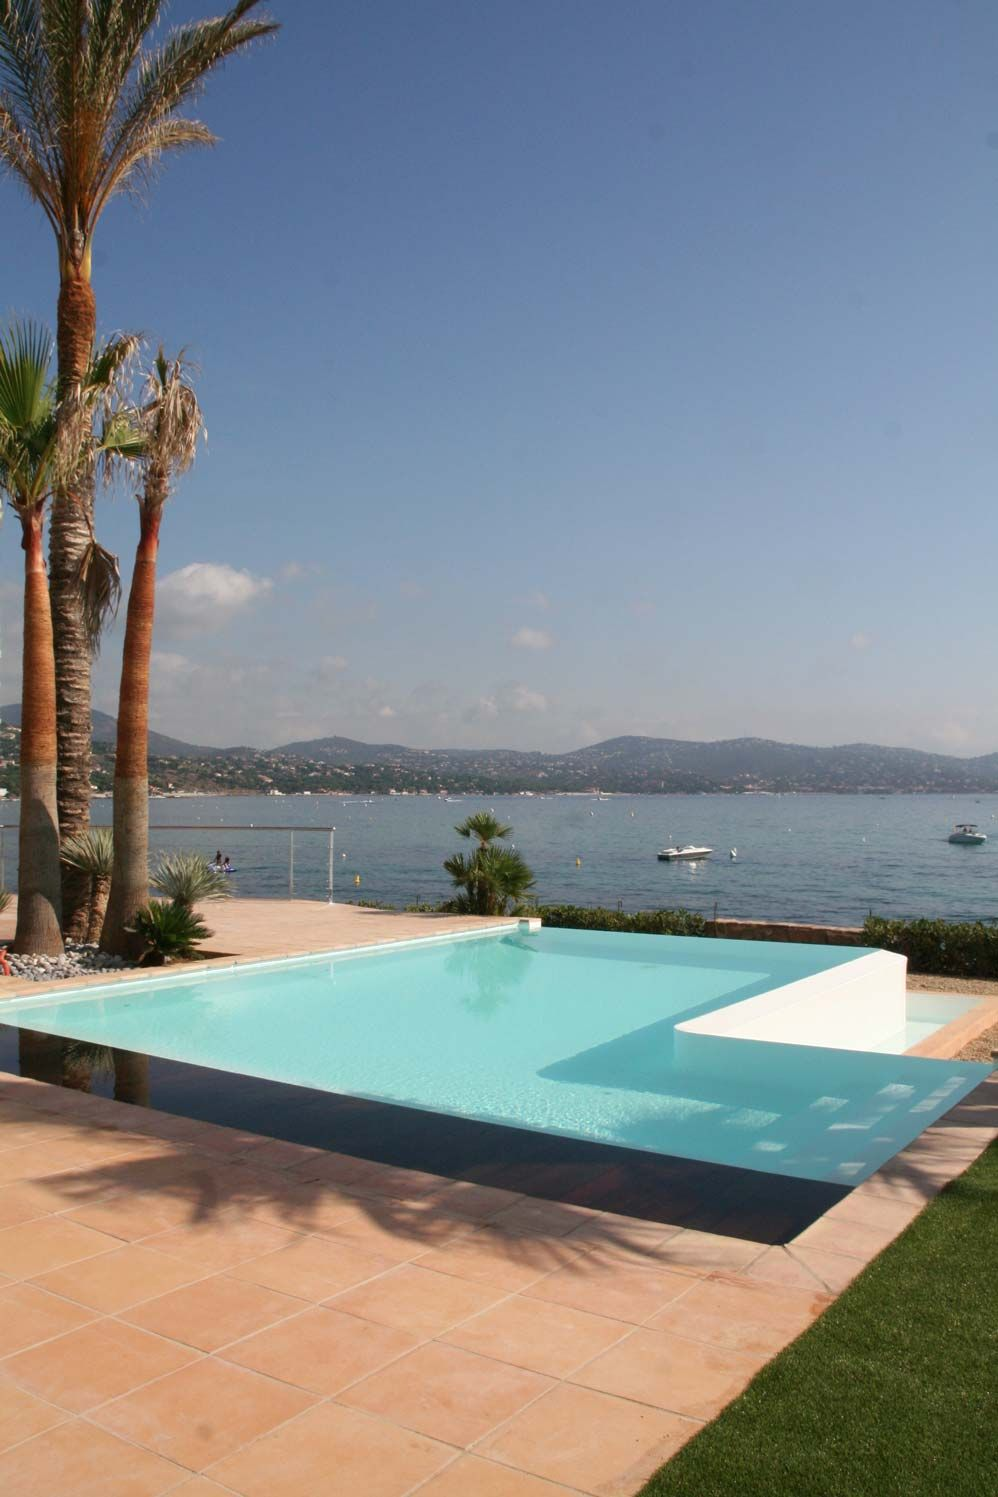 Piscina com borda infinita piscinas desjoyaux for Piscinas desjoyaux